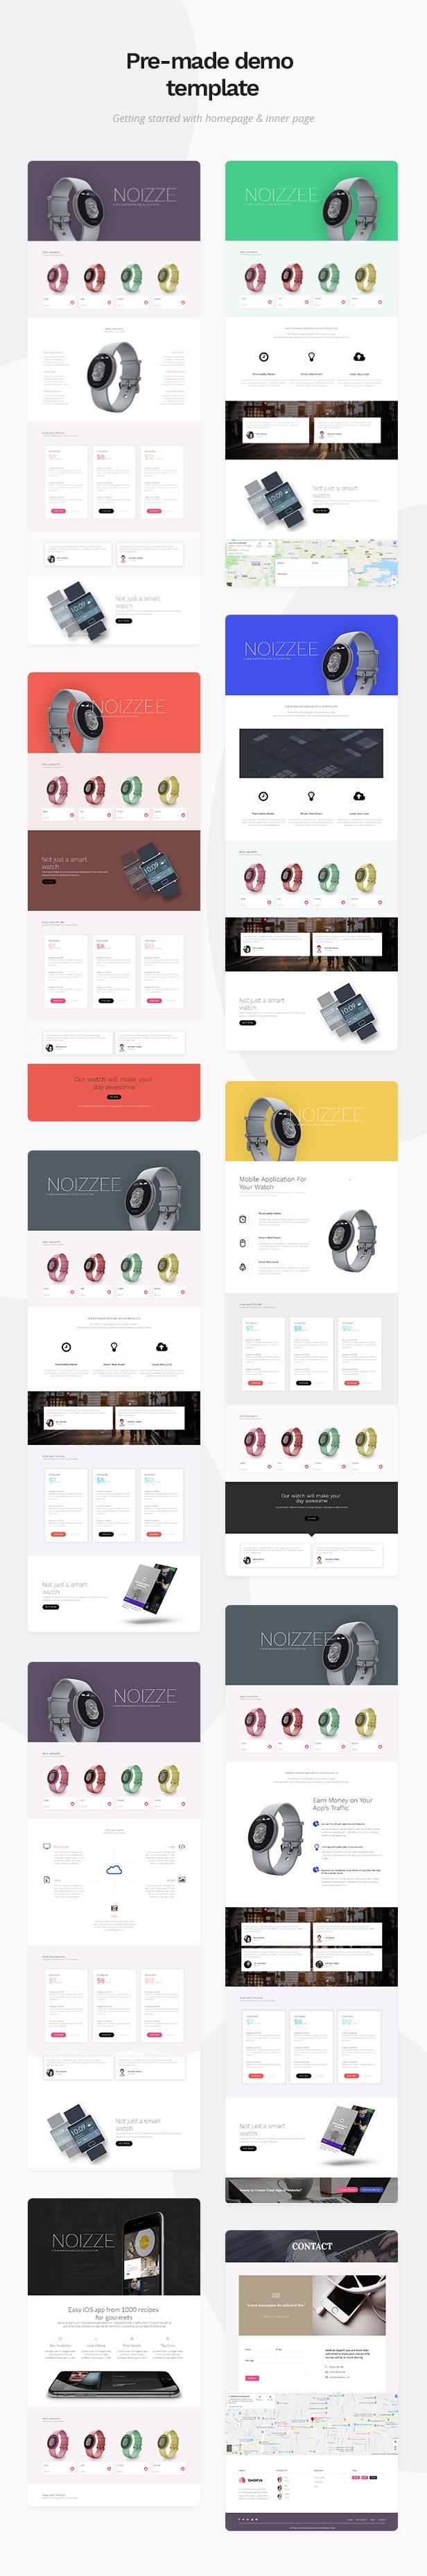 Shopia - Single Product WooCommerce WordPress Theme - 1